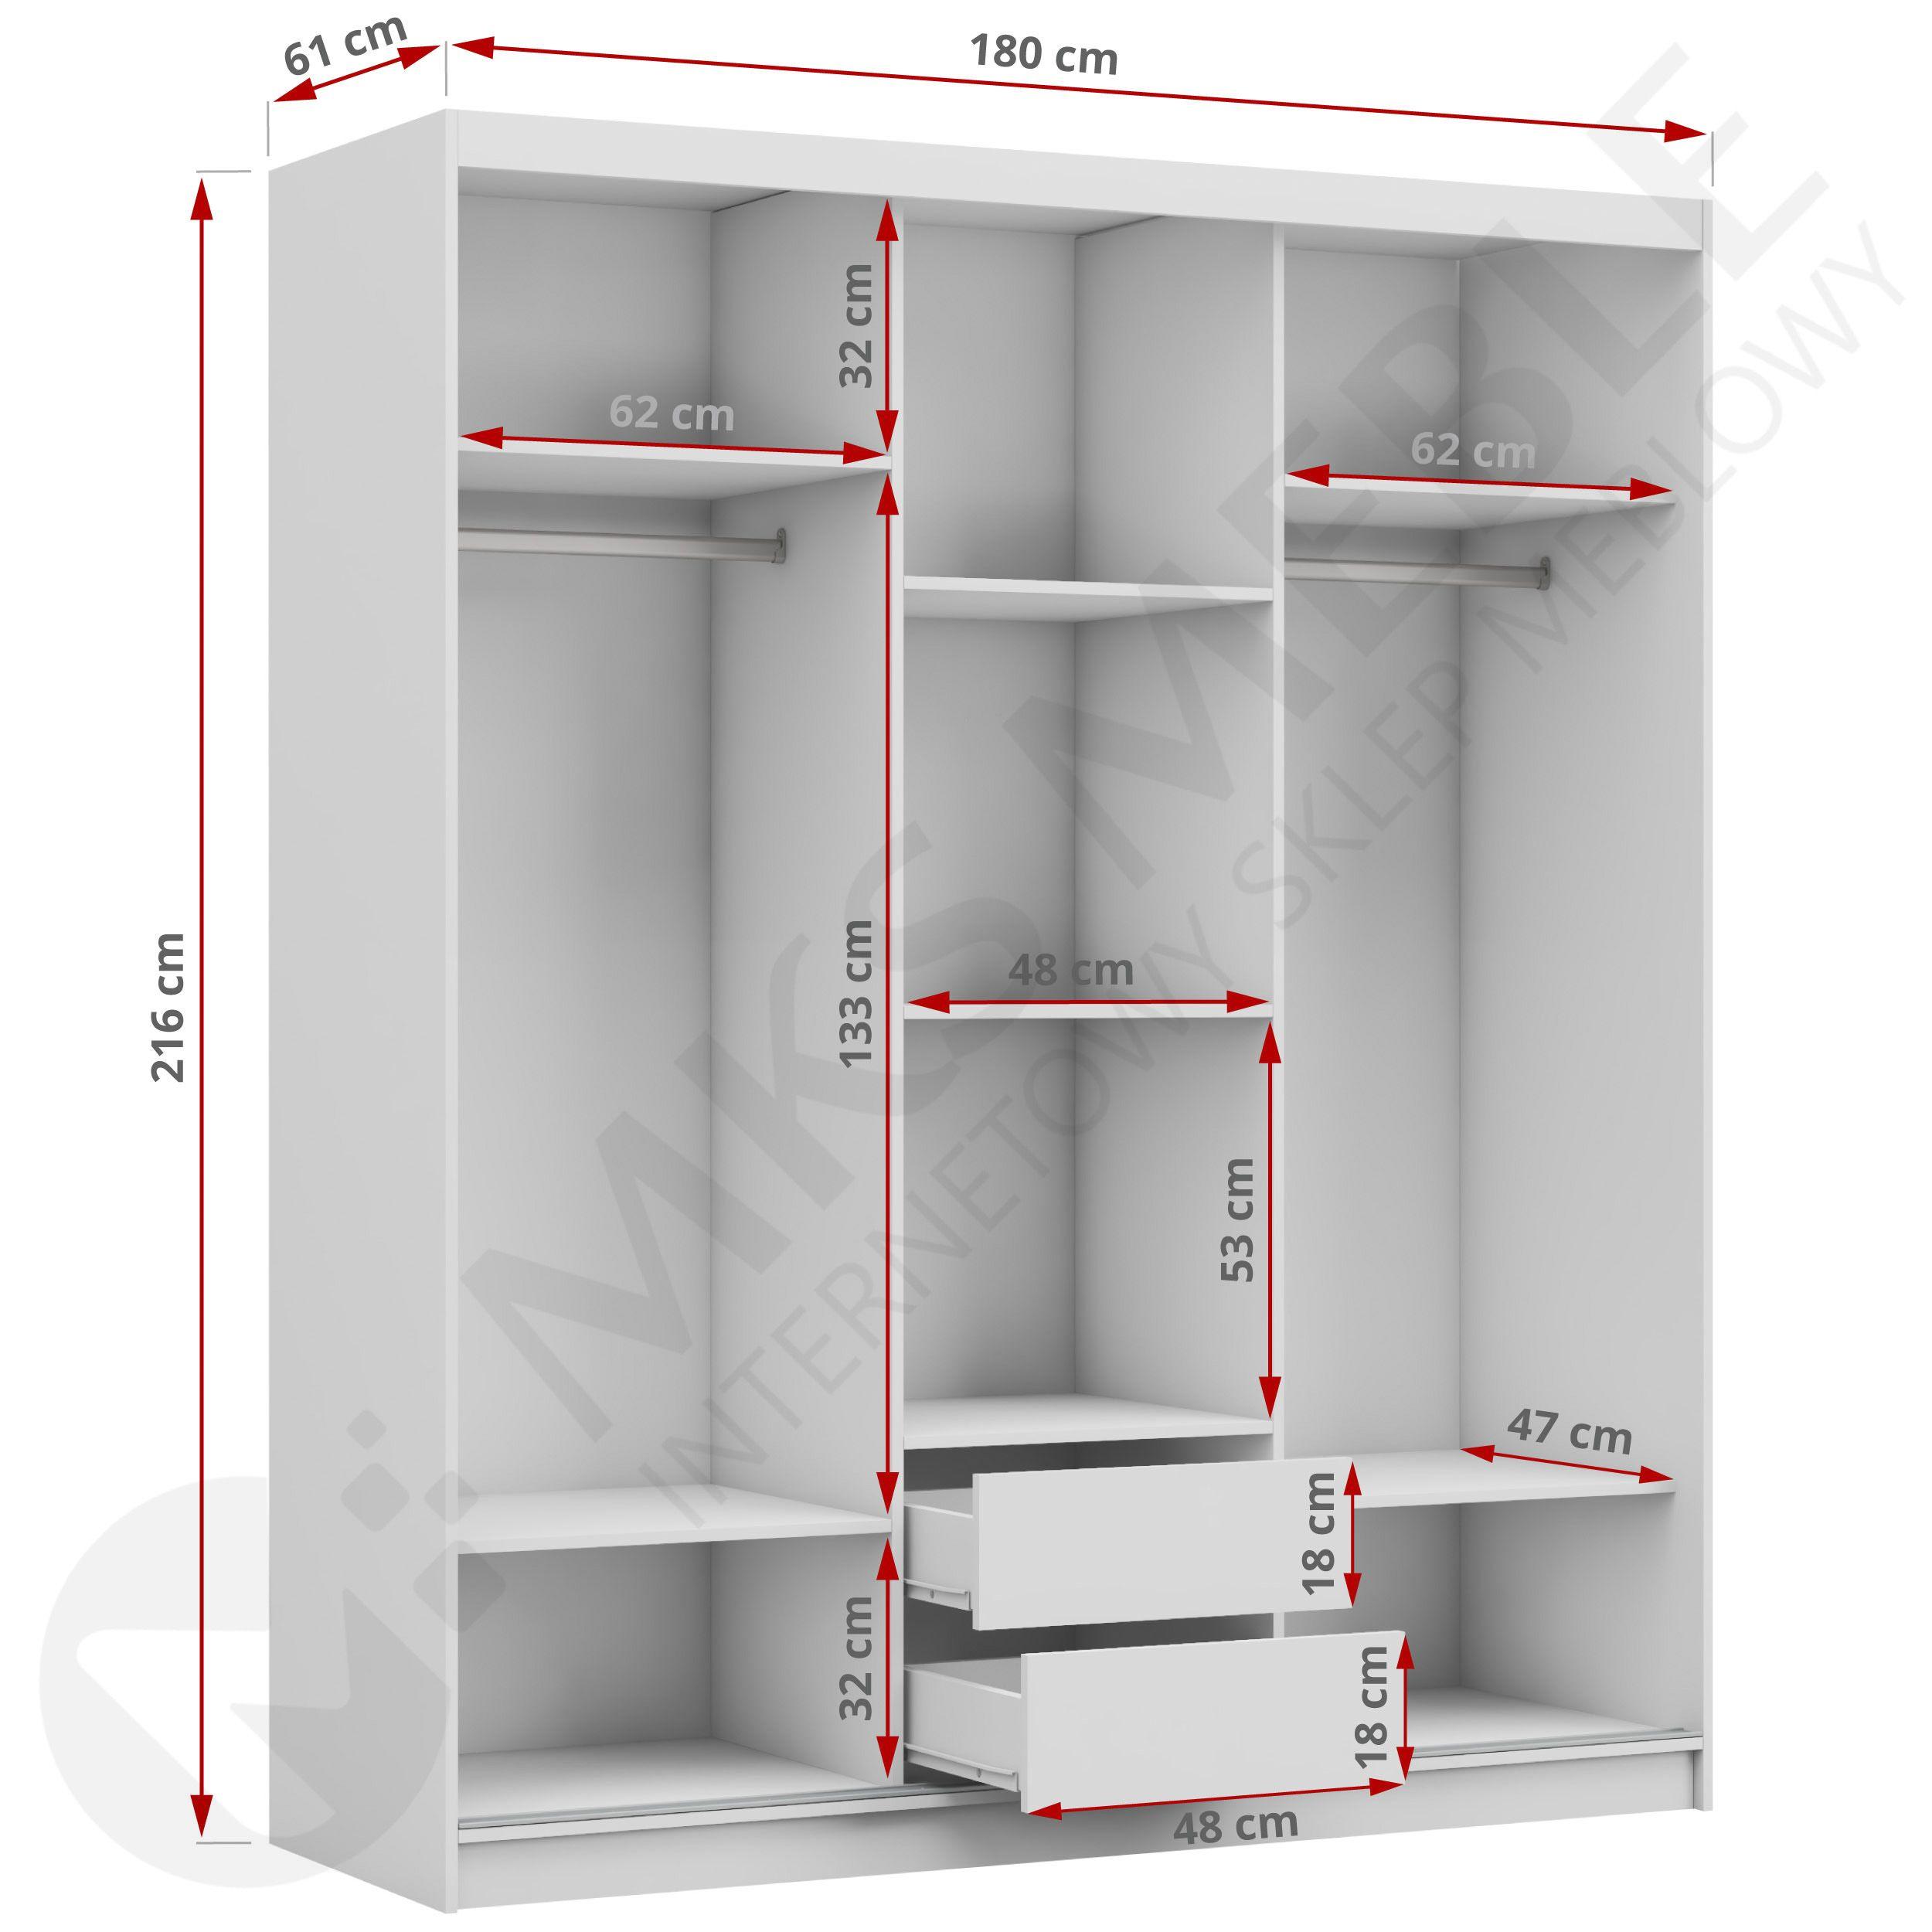 Duza Szafa Trzydrzwiowa Ze Szklem Lacobel I Lustrem Walencja Shelving Home Decor Shelves